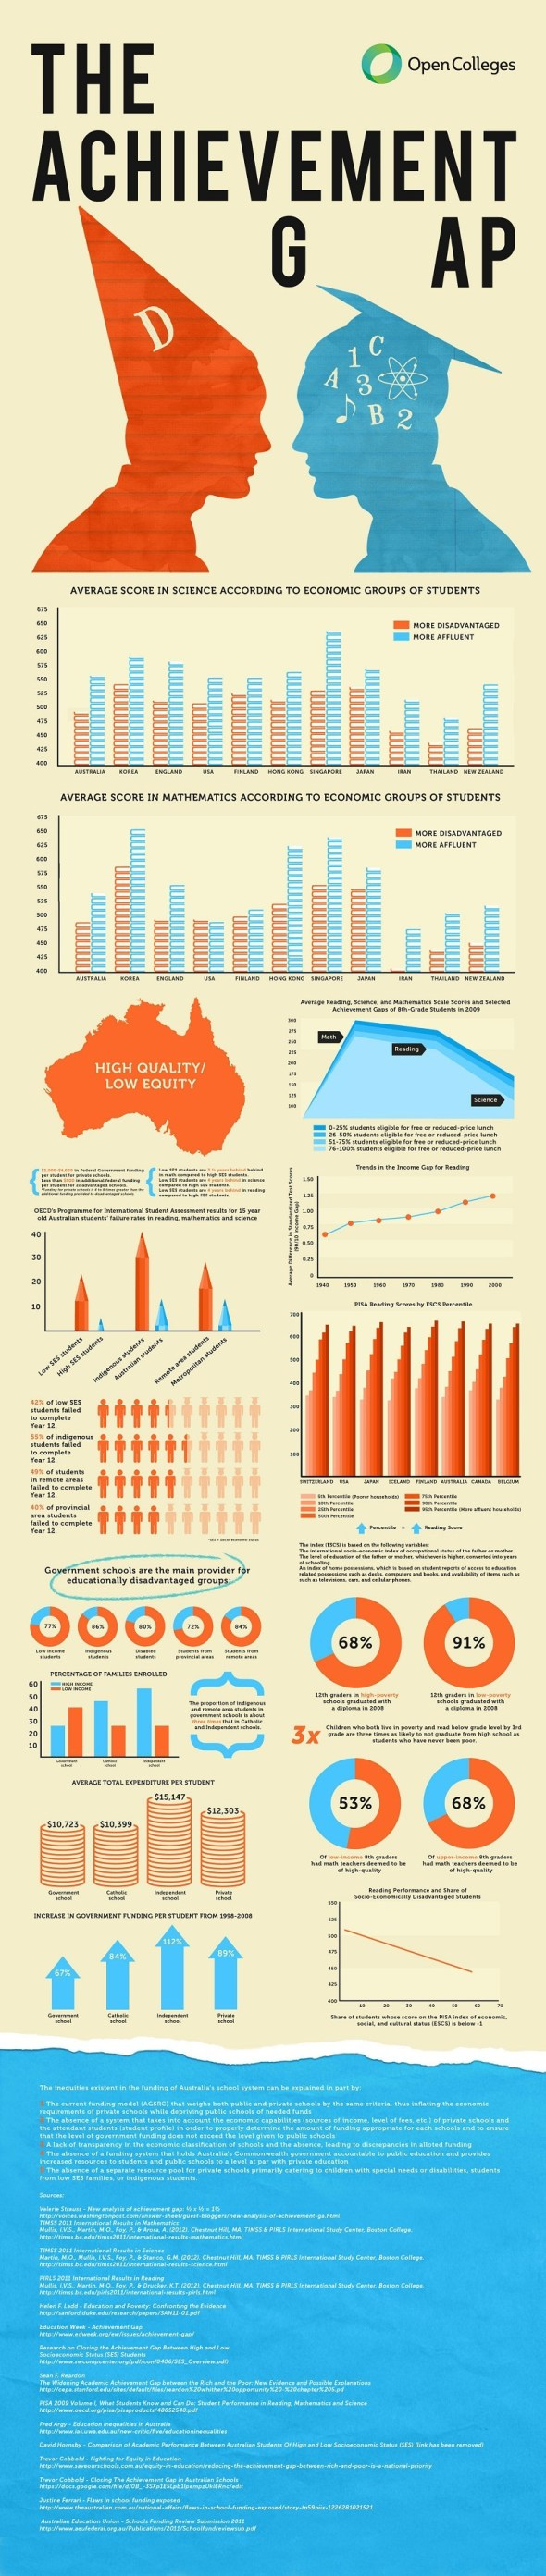 Achievement-Gap-Infographic-2